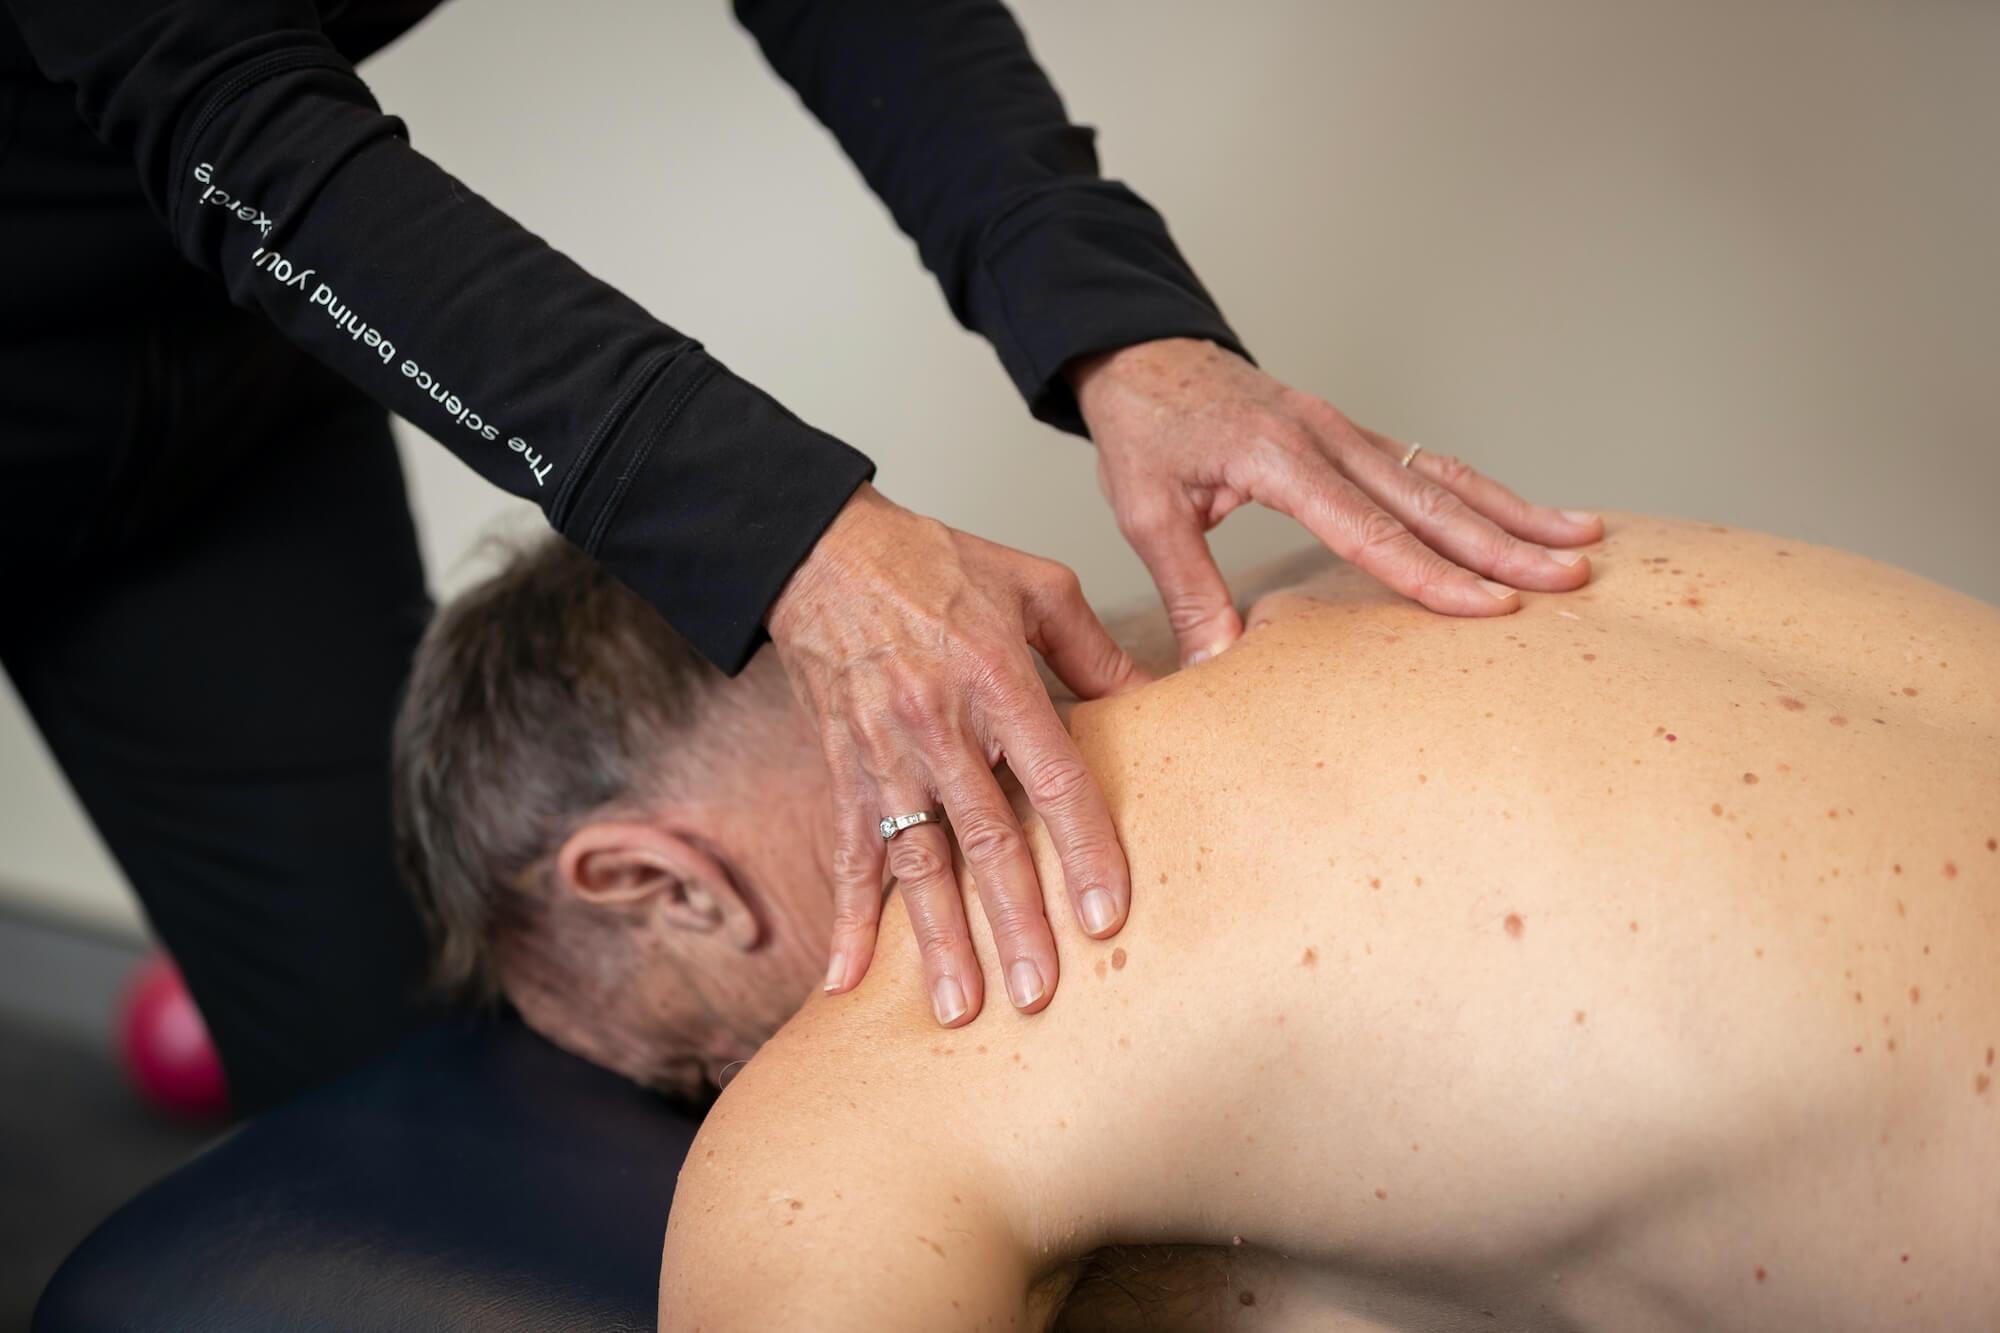 Man receiving upper back physio massage